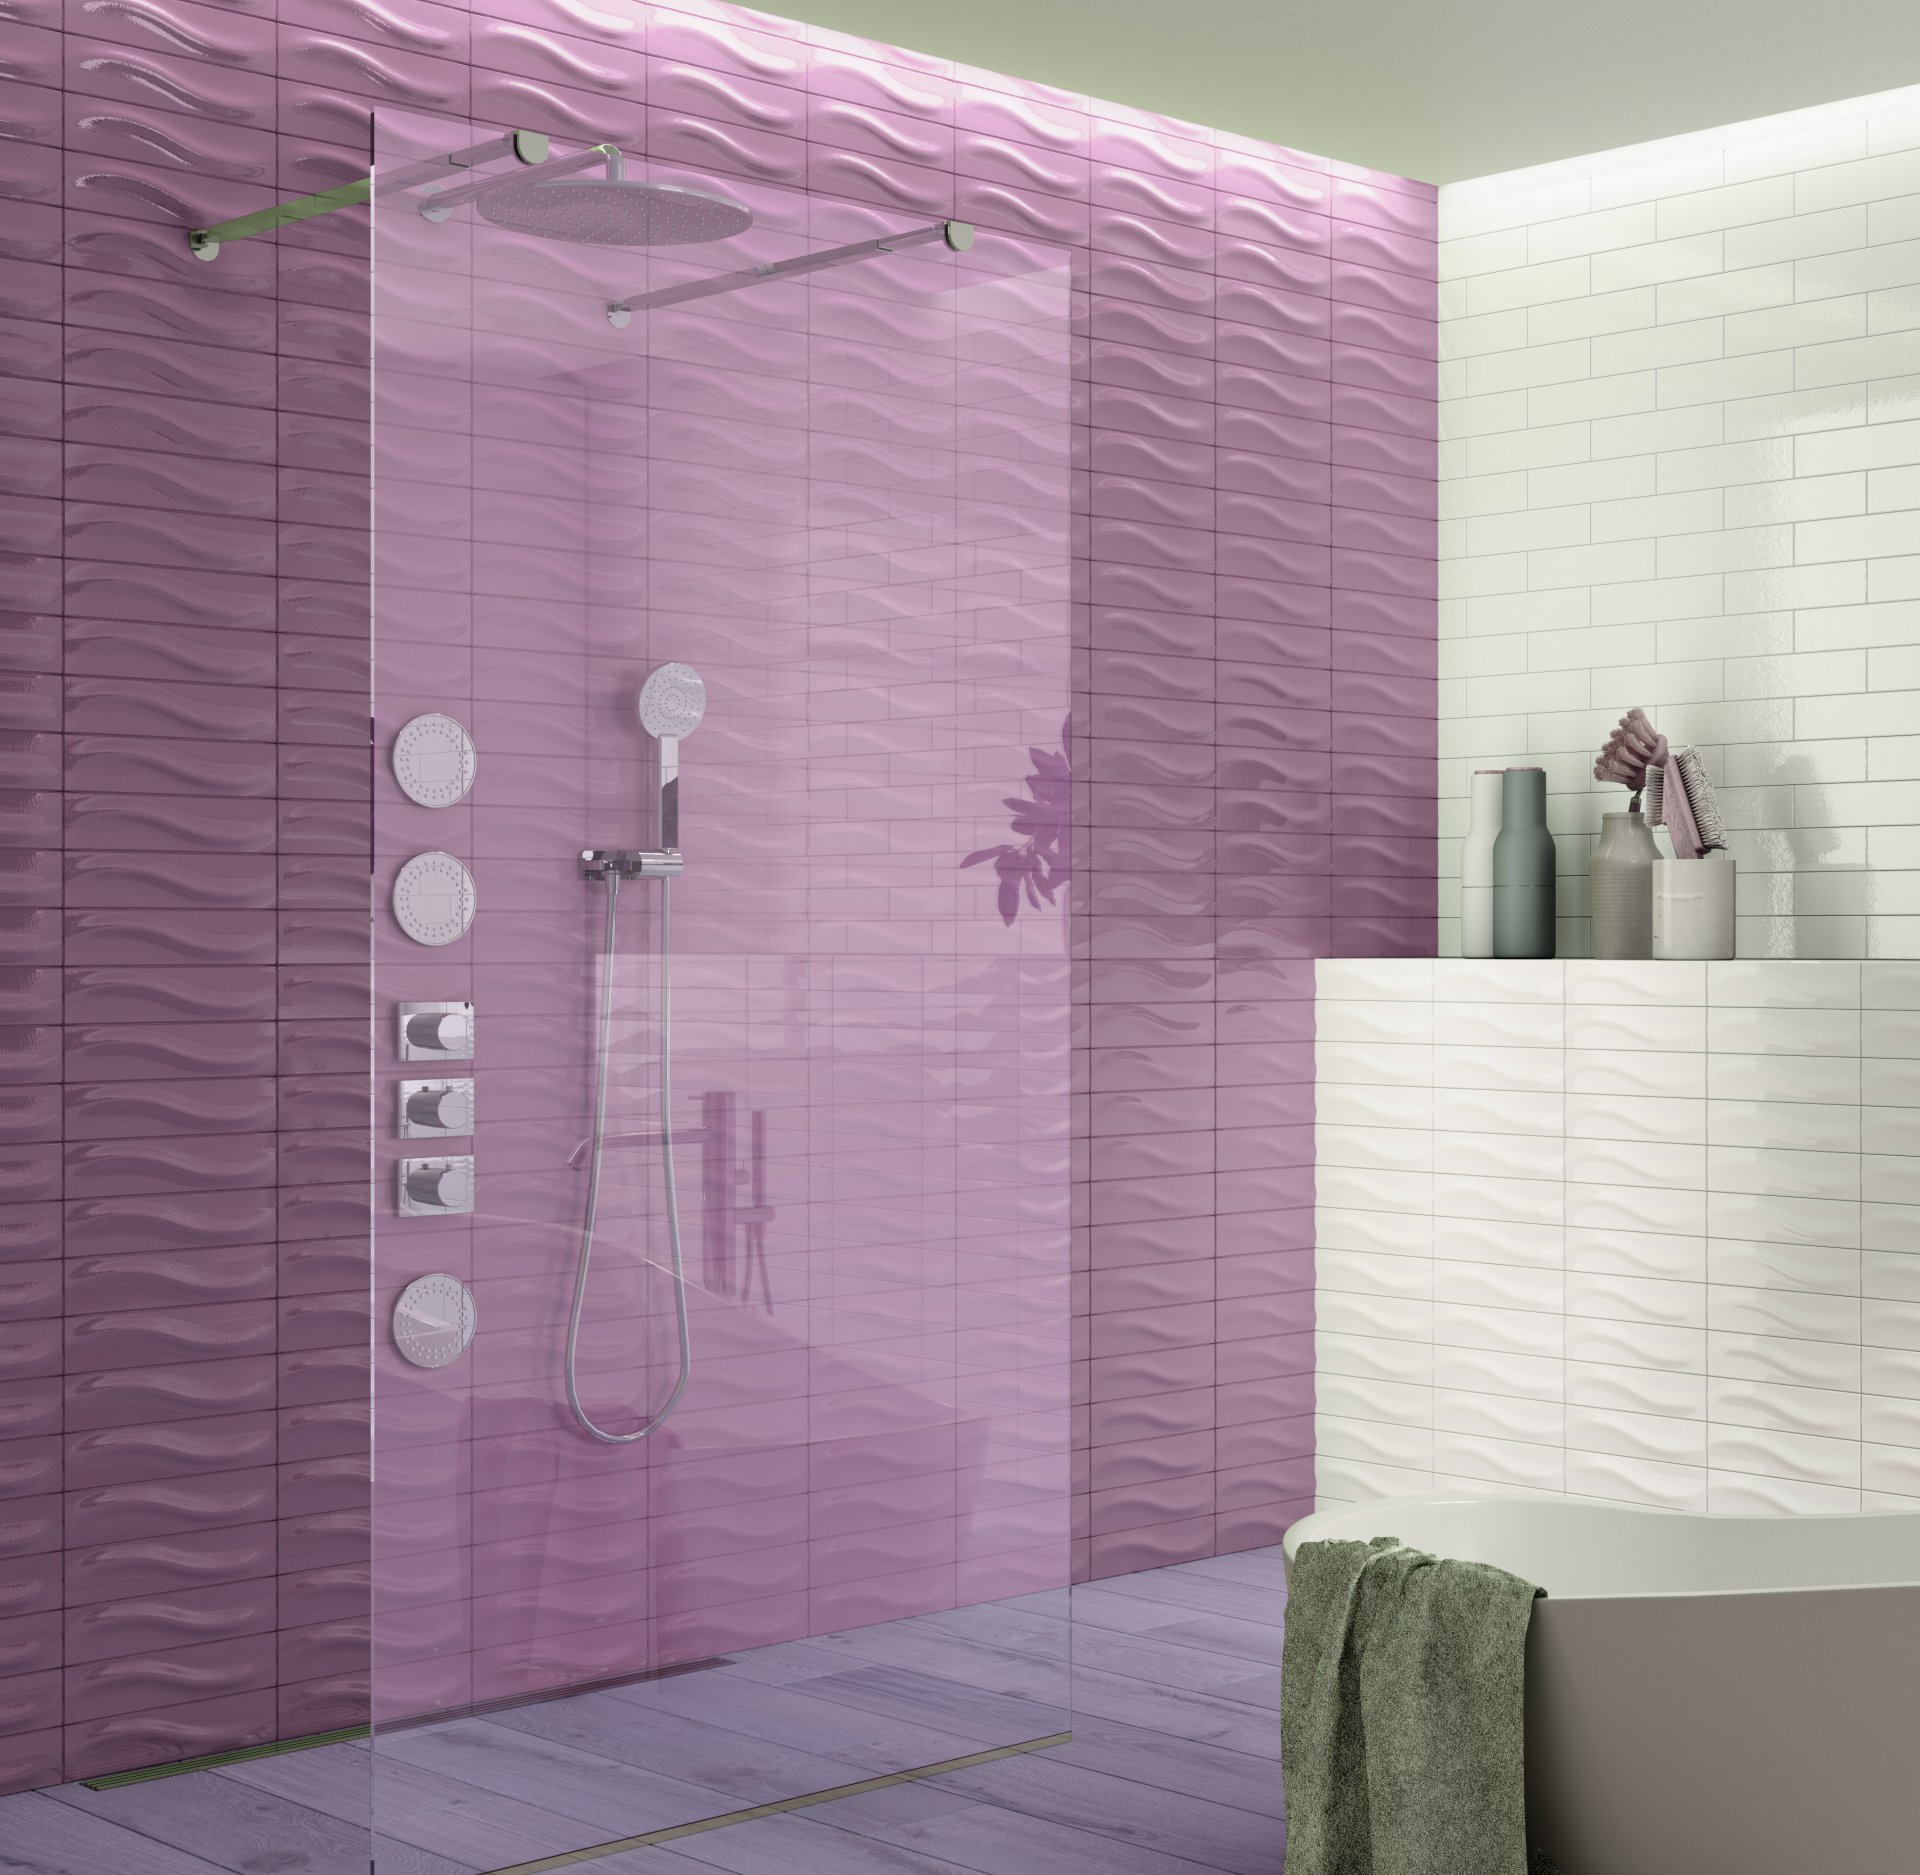 3x12 Bellini Metro Decor Rose Ceramic Glossy Wall Tile